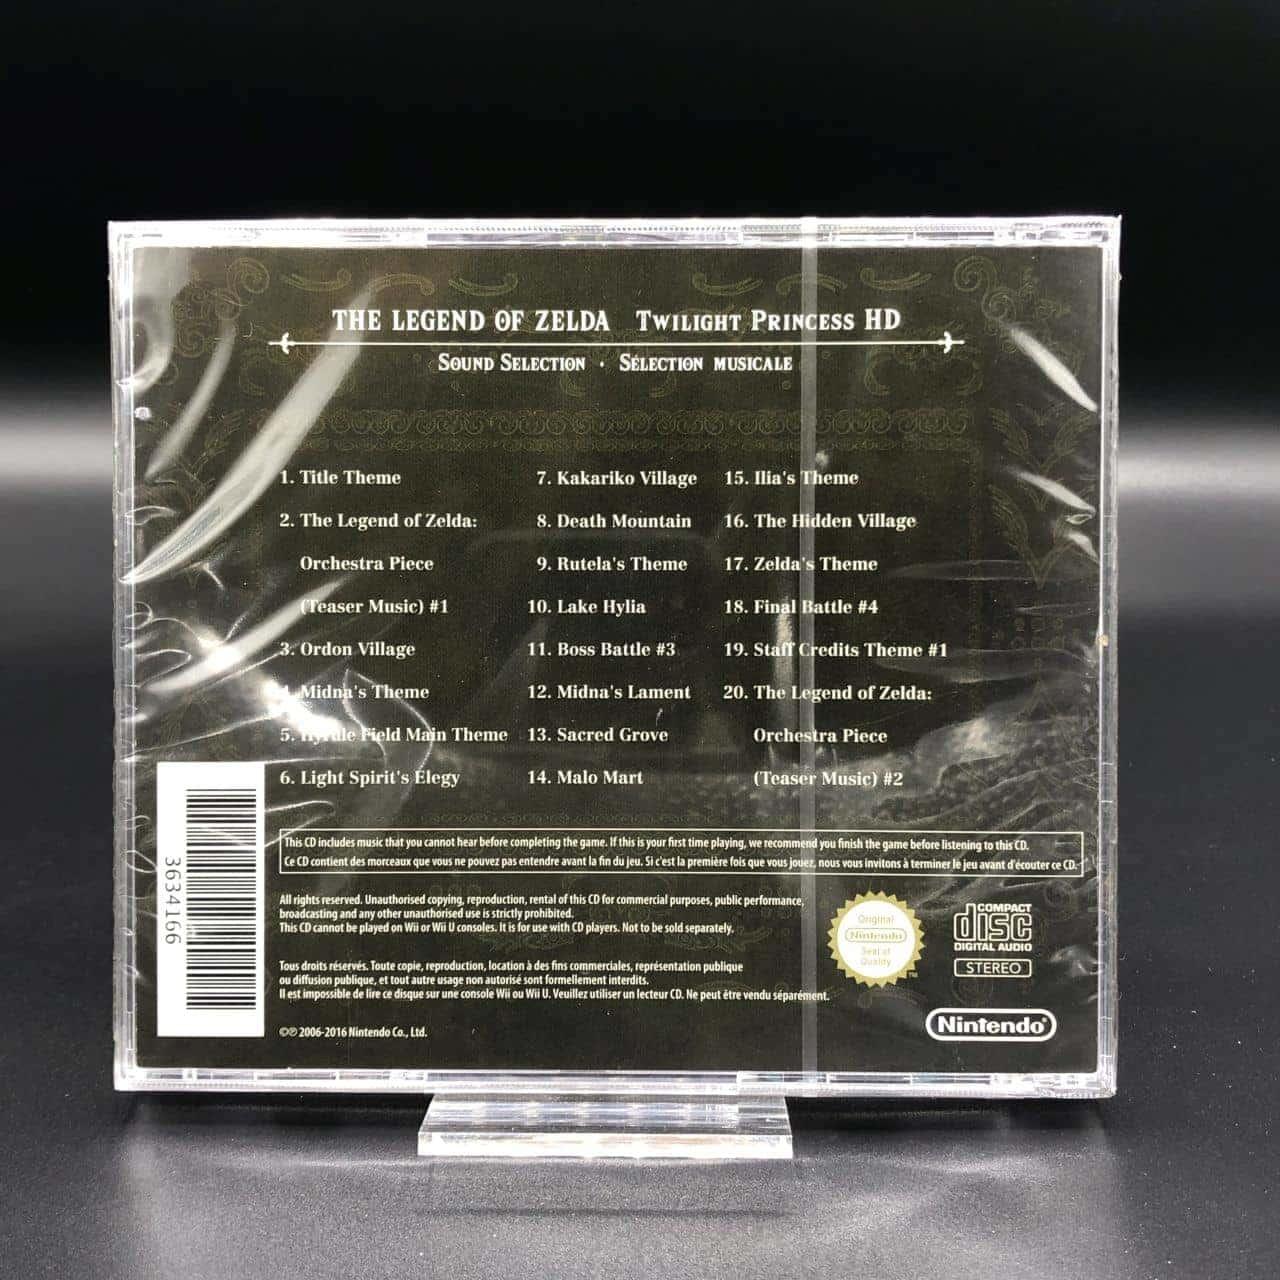 The Legend of Zelda Twilight Princess HD (Soundtrack) (NEU)